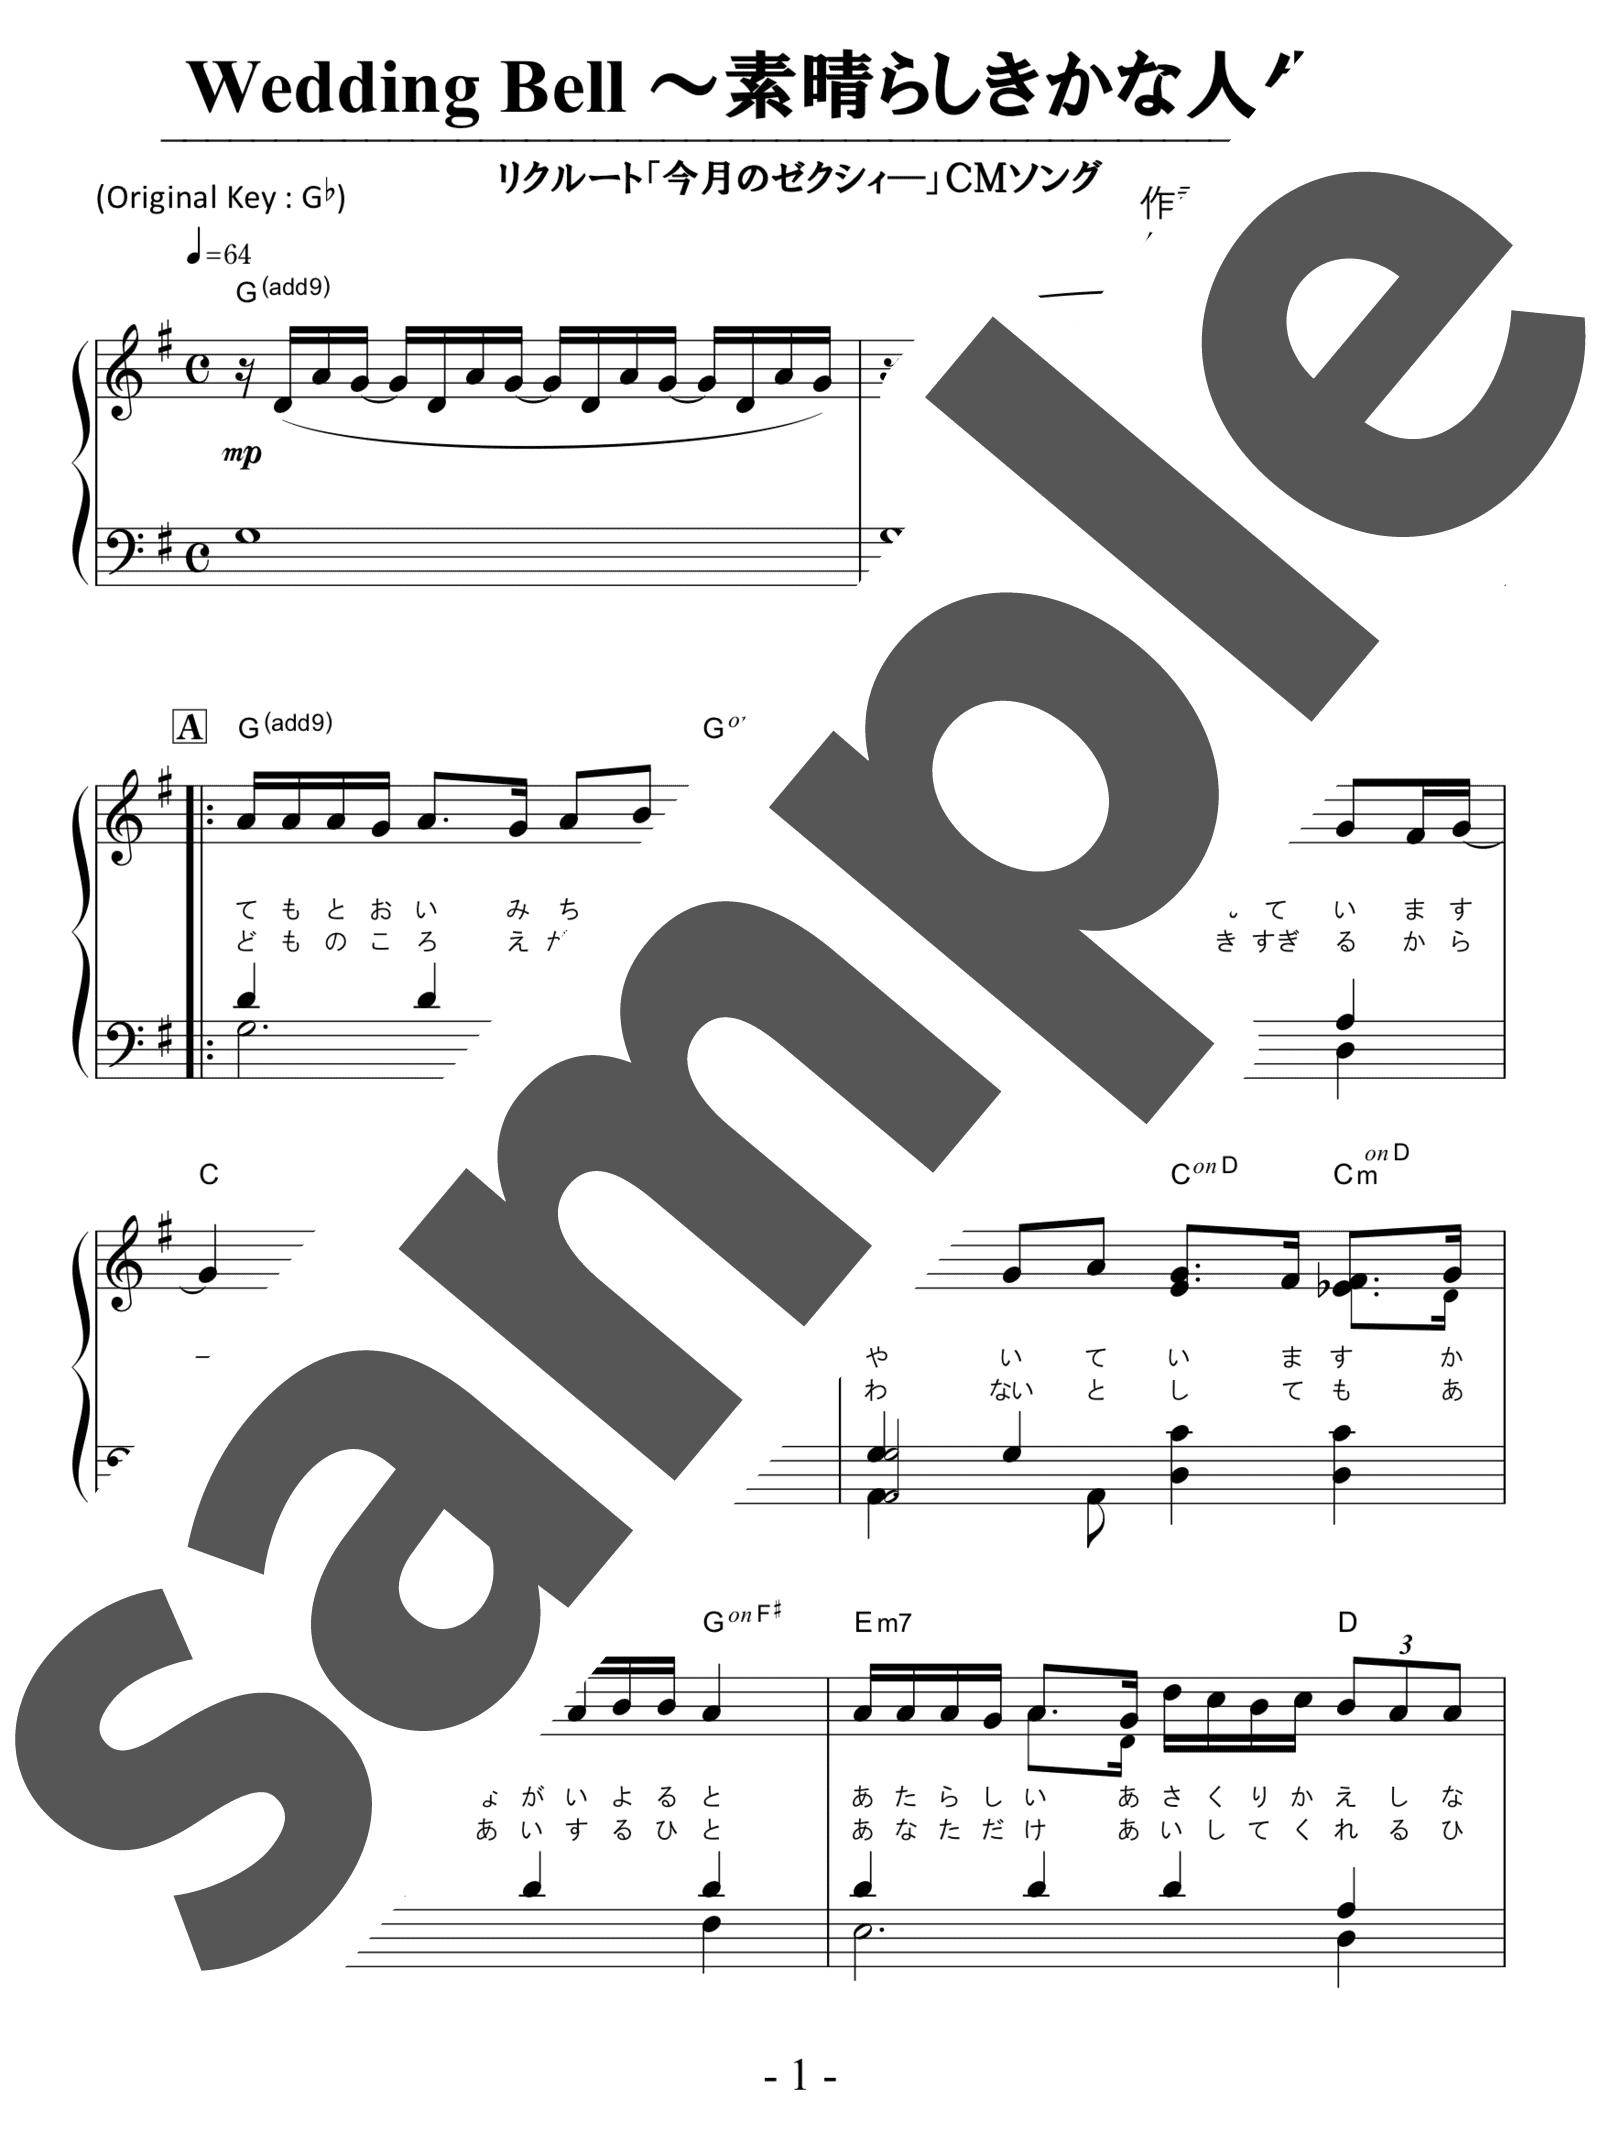 「Wedding Bell ~素晴らしきかな人生~」のサンプル楽譜